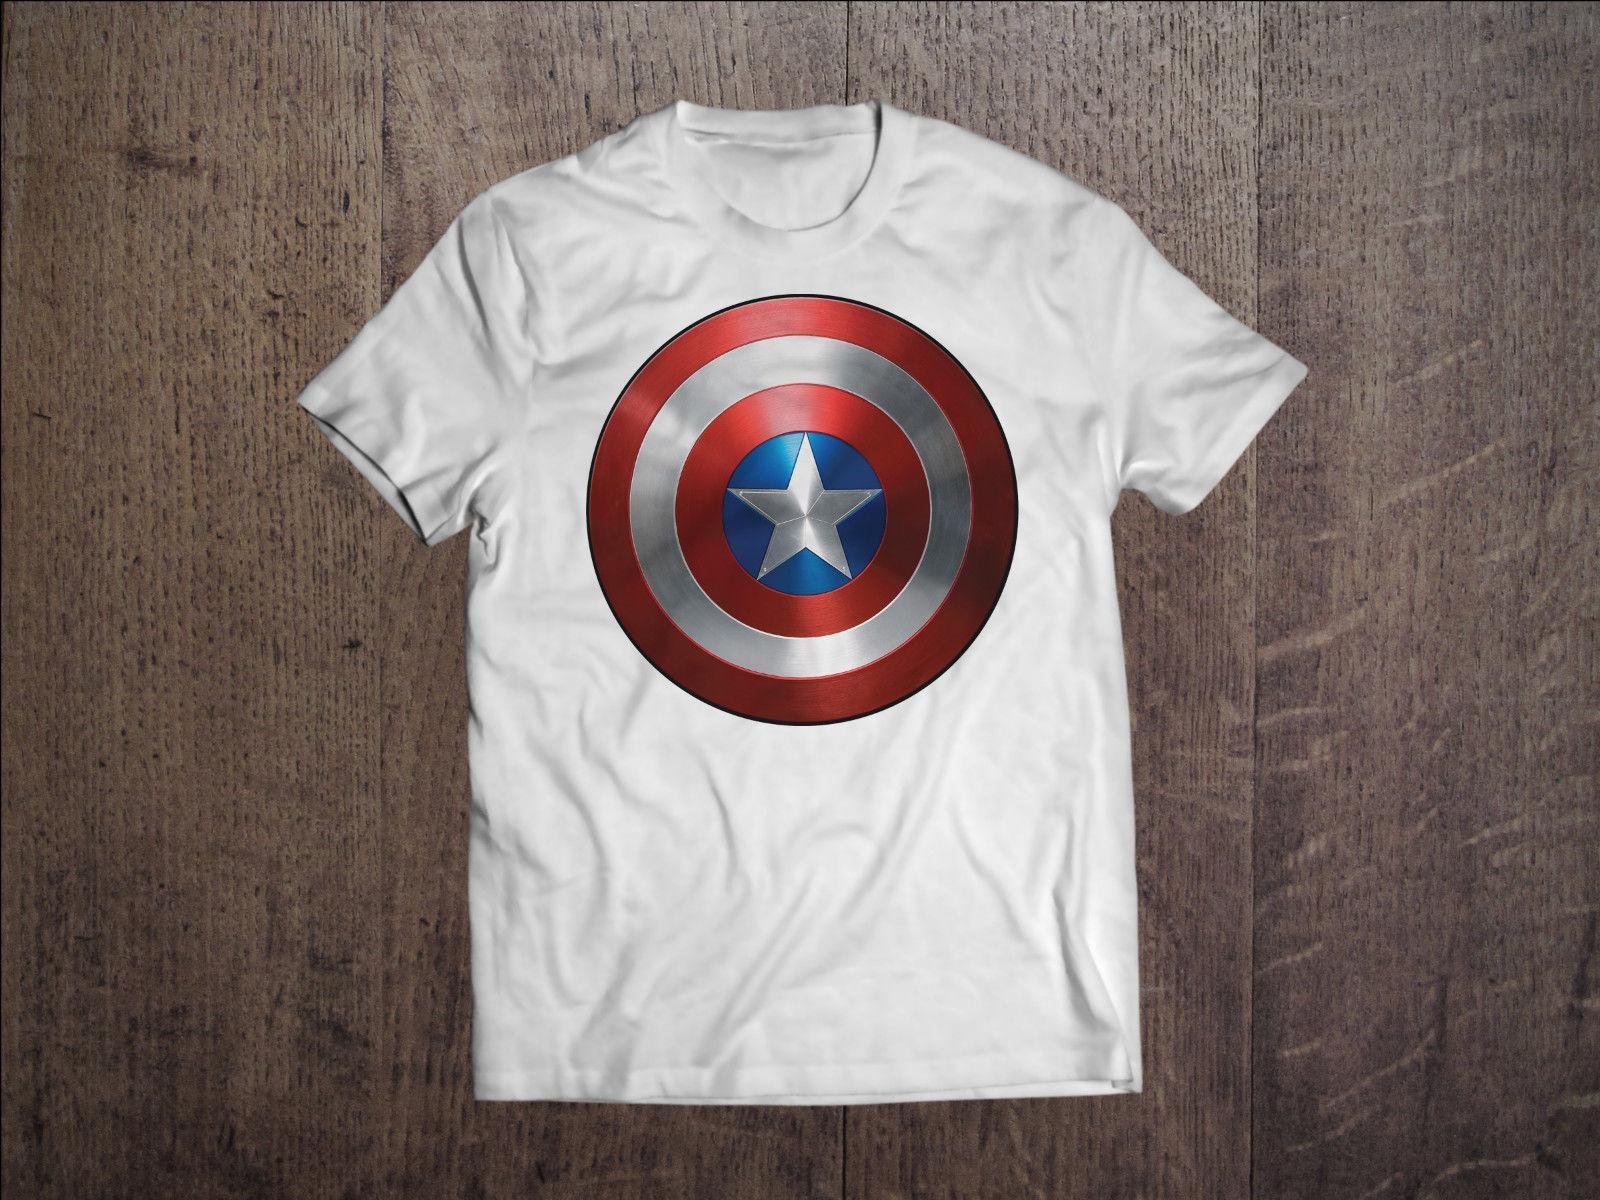 women bright n colour authentic quality Captain America Men White T-shirt Marvel Tee The Avengers T-Shirt Comics  Shirt Men Women Unisex Fashion tshirt Free Shipping black